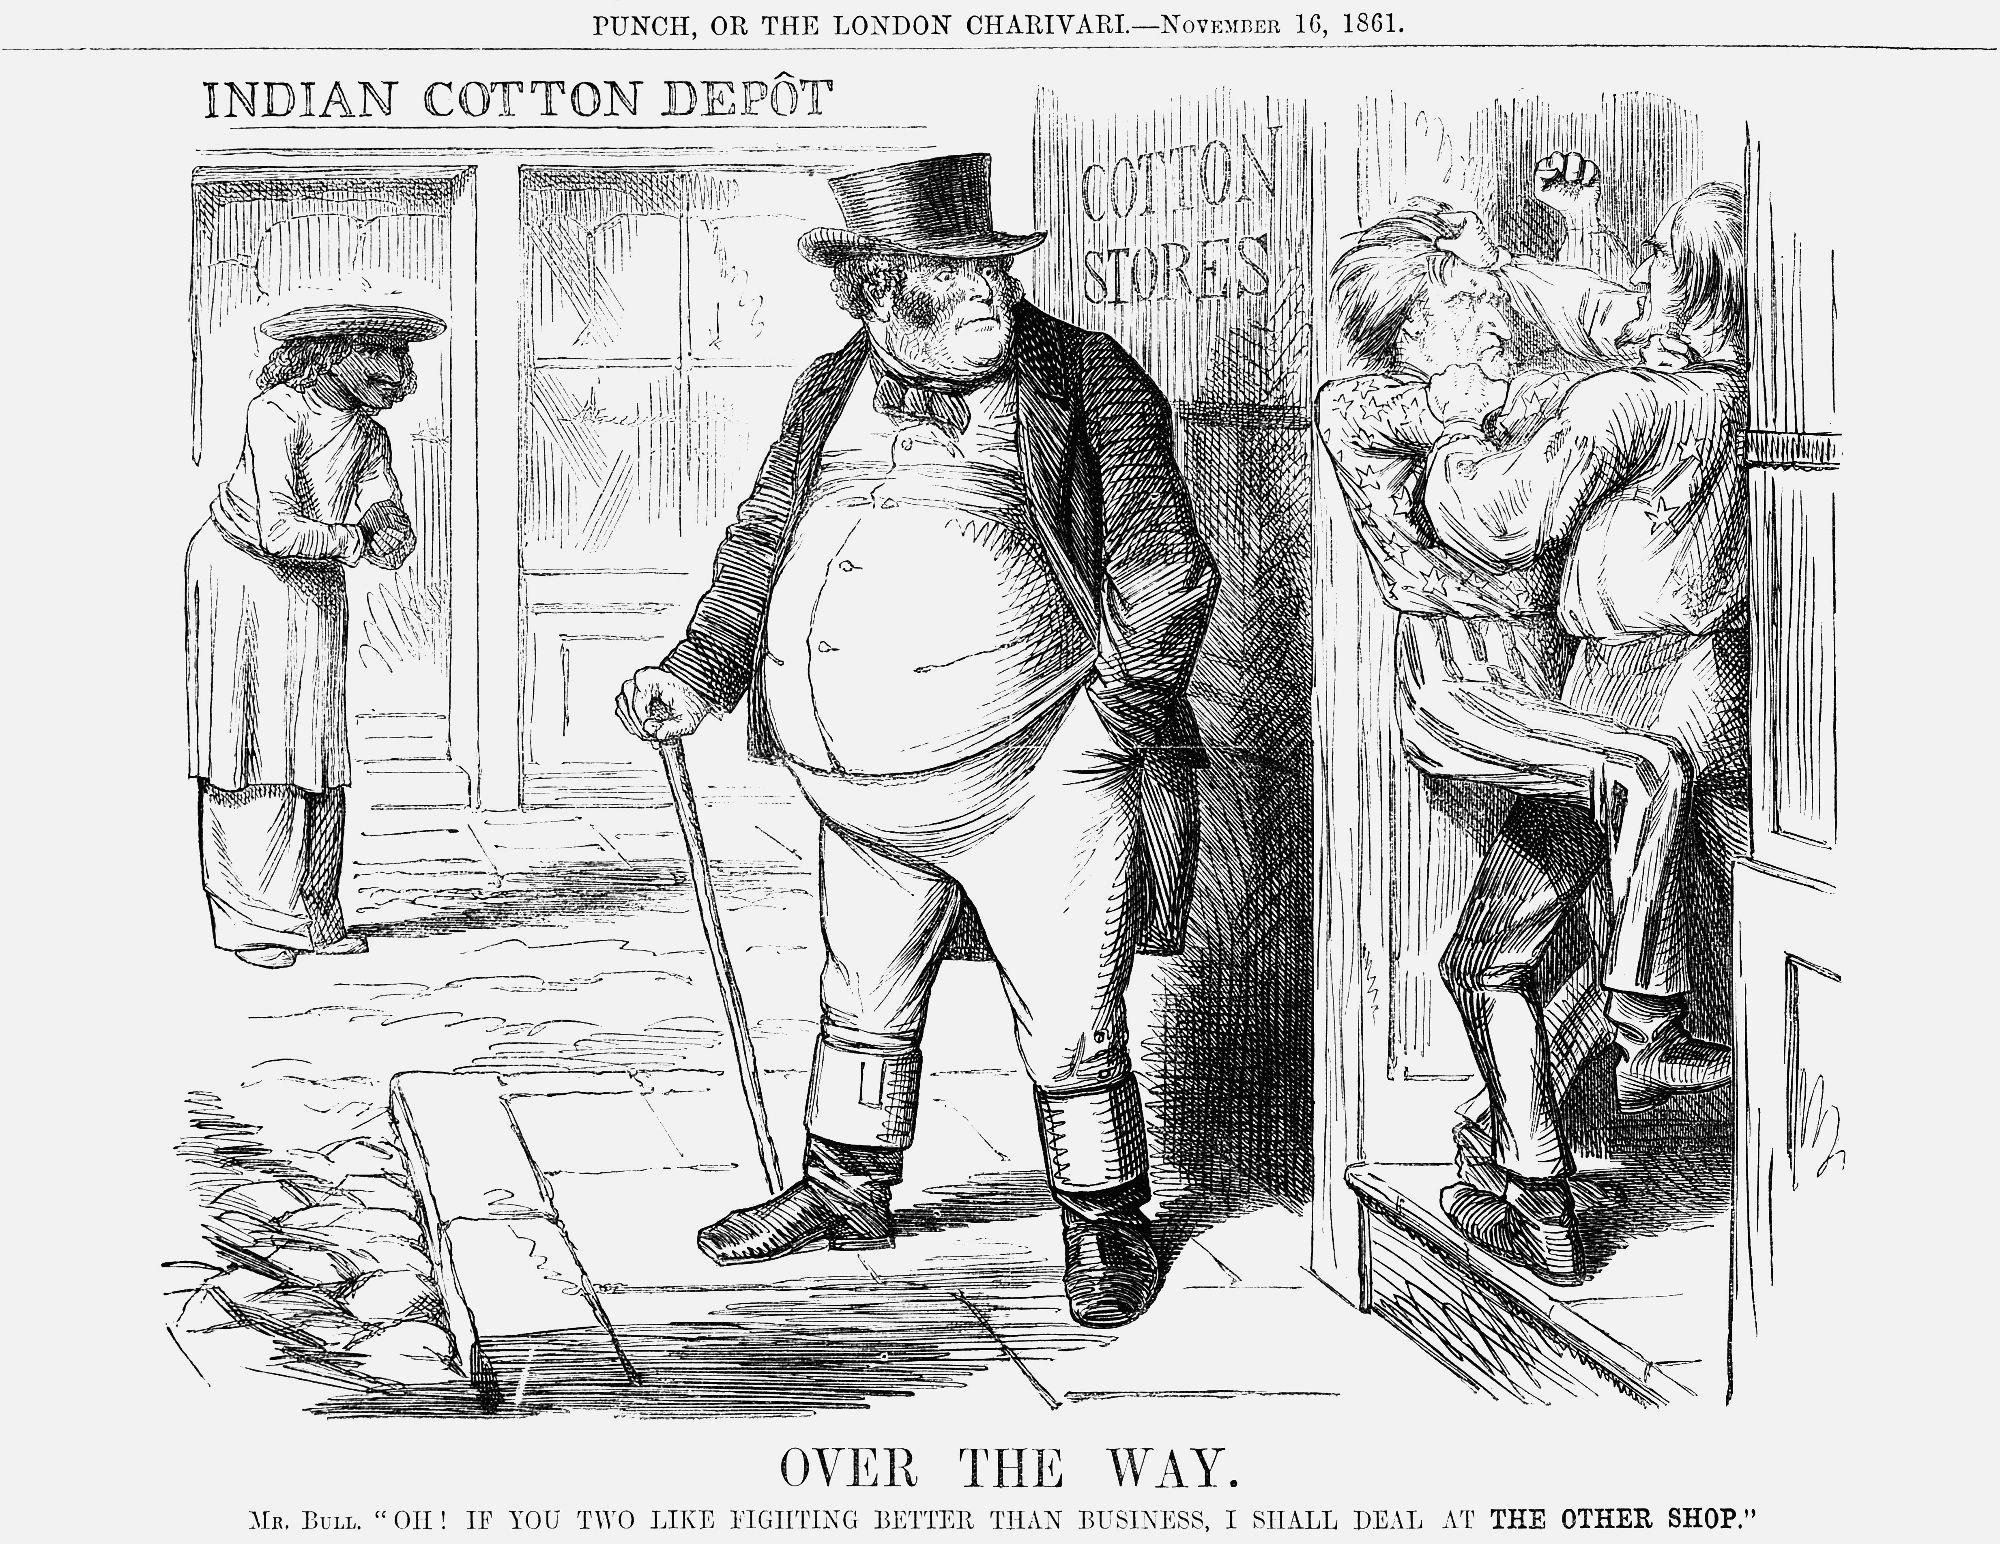 The Indian Mutiny Political Cartoon